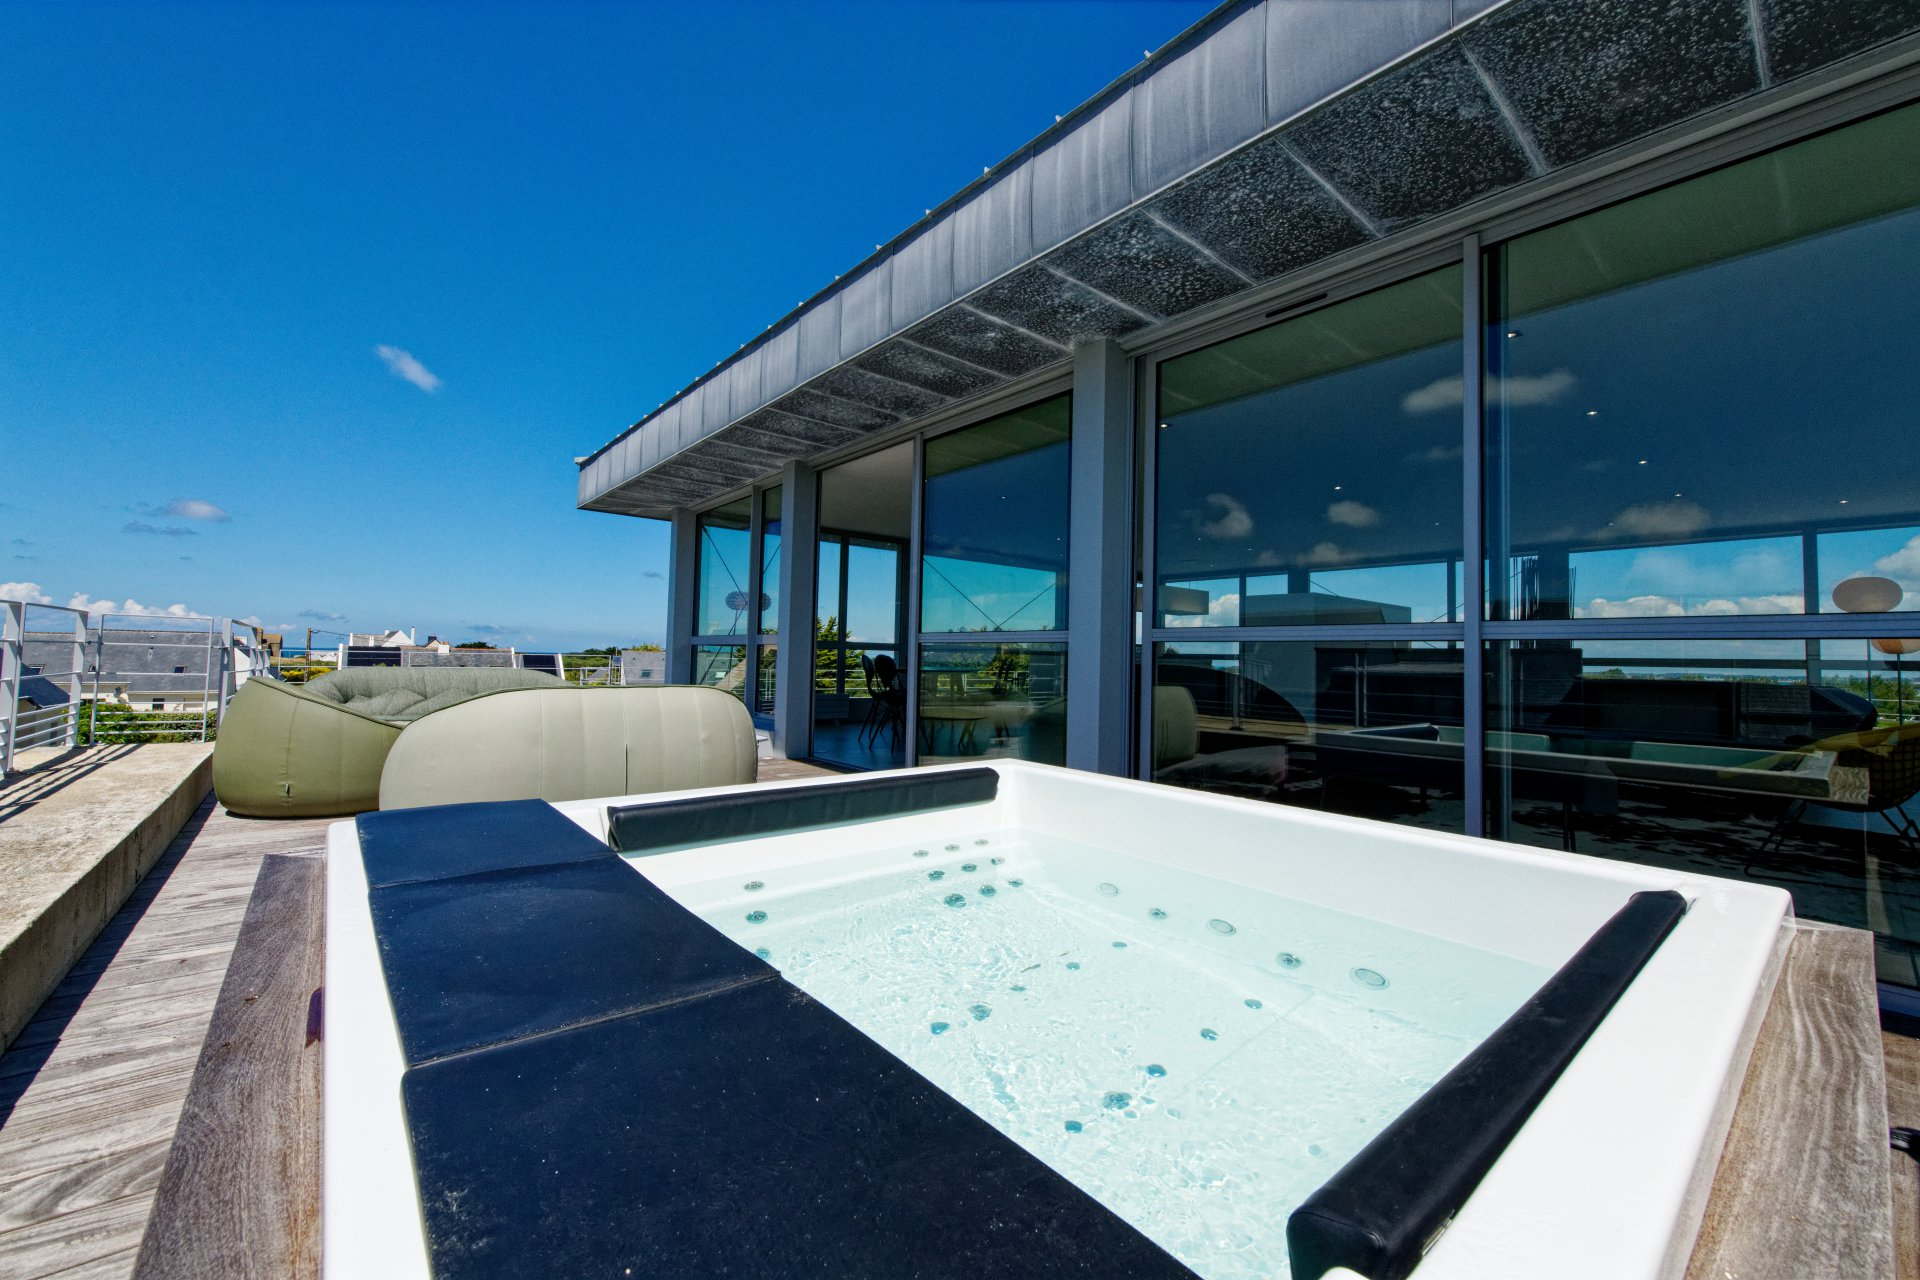 Toit terrasse, cube en verre, design